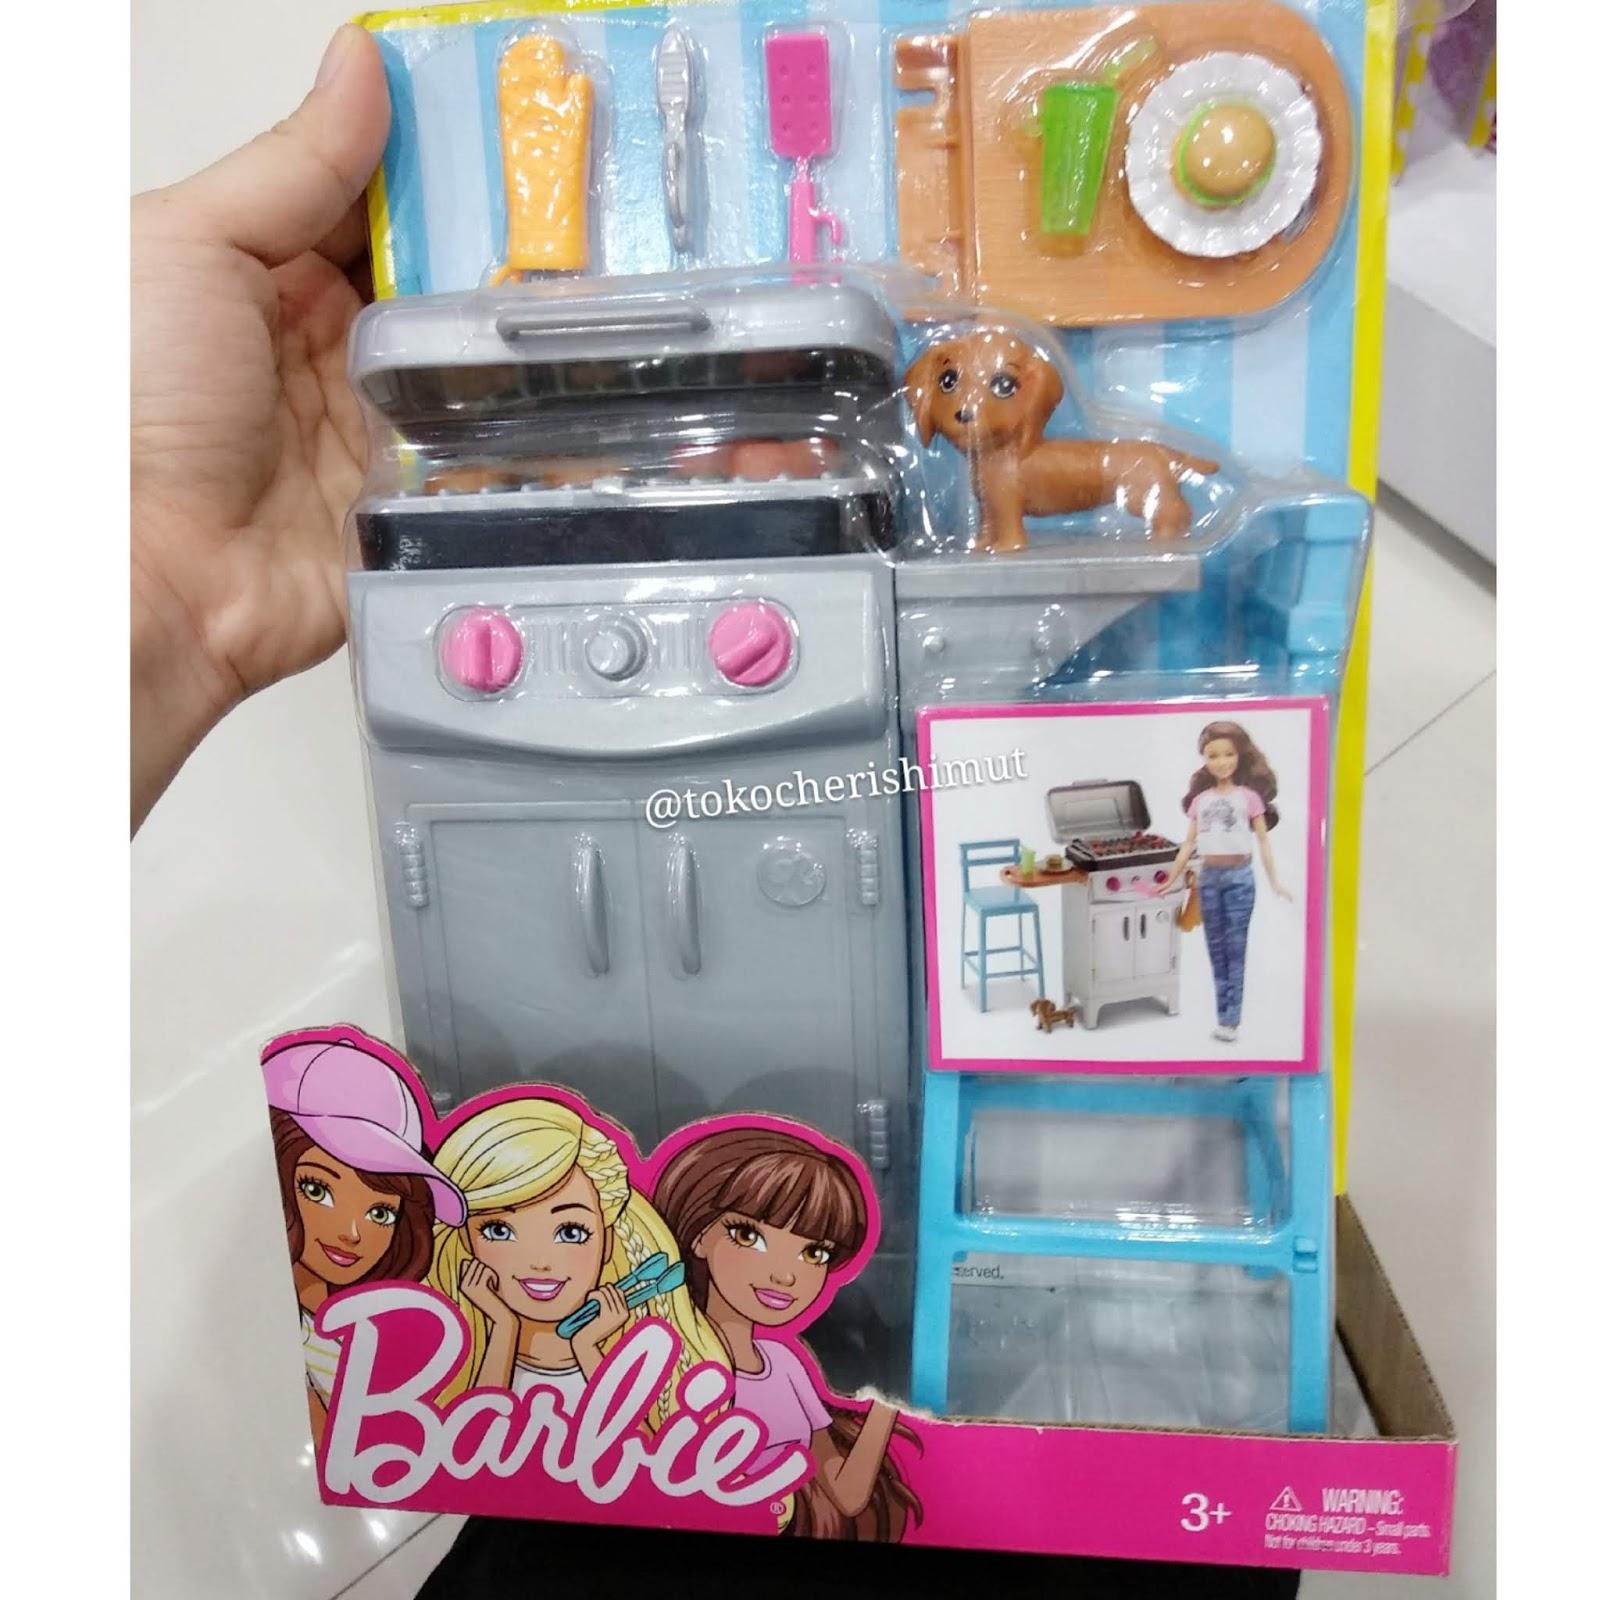 Furniture Barbie Untuk Masak Bbq Baberque Murah Grosir Ecer Toko Cherish Imut